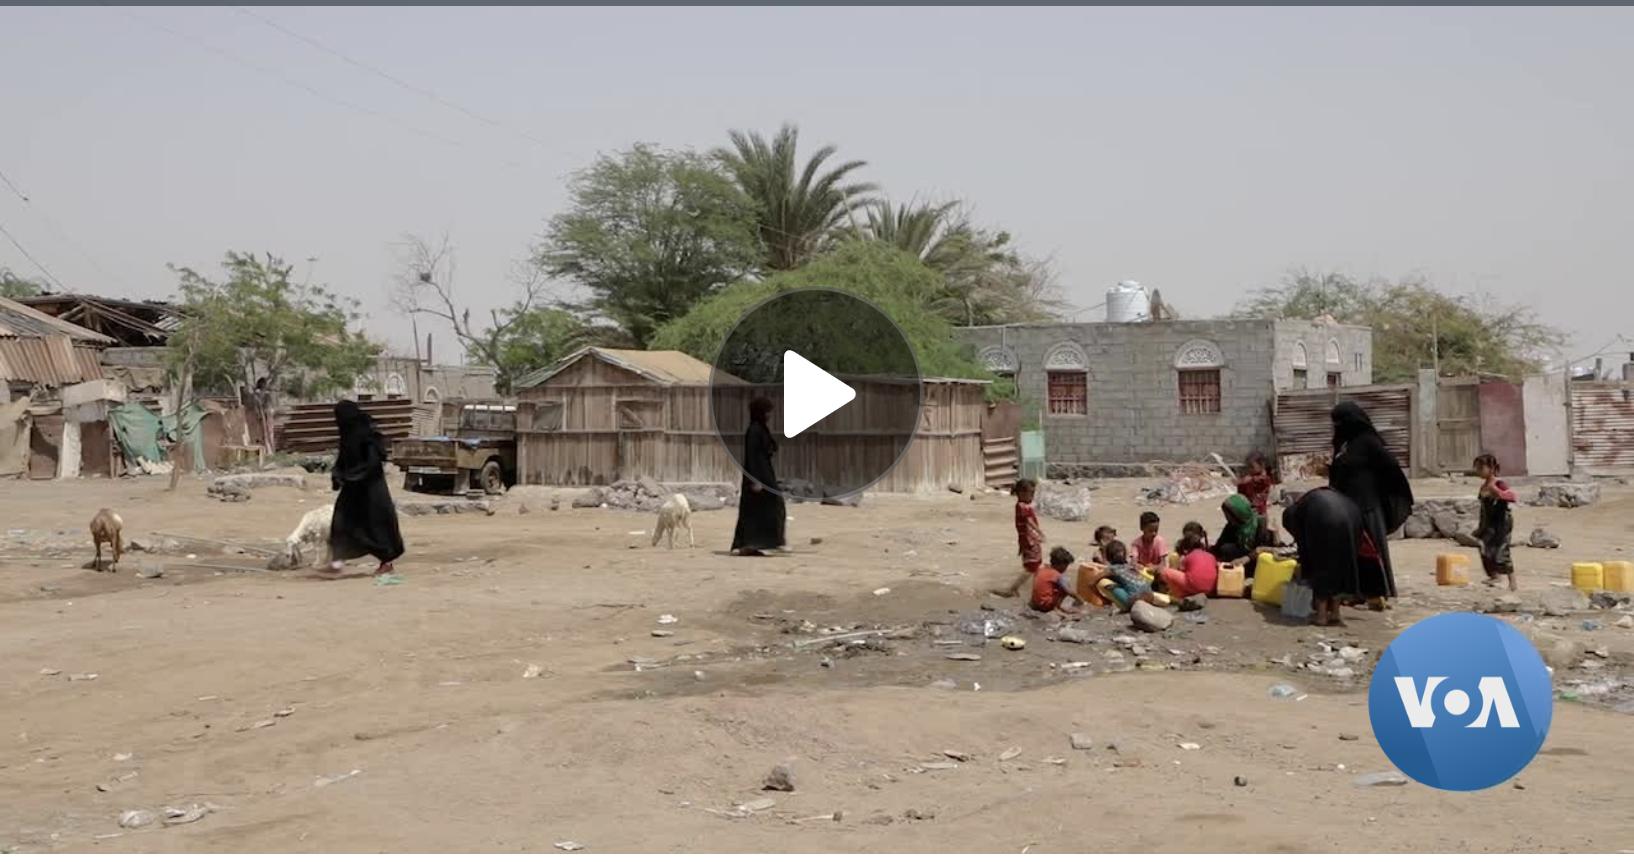 Center Works to Empower Yemen's Women and Girls – Voice of America (image)